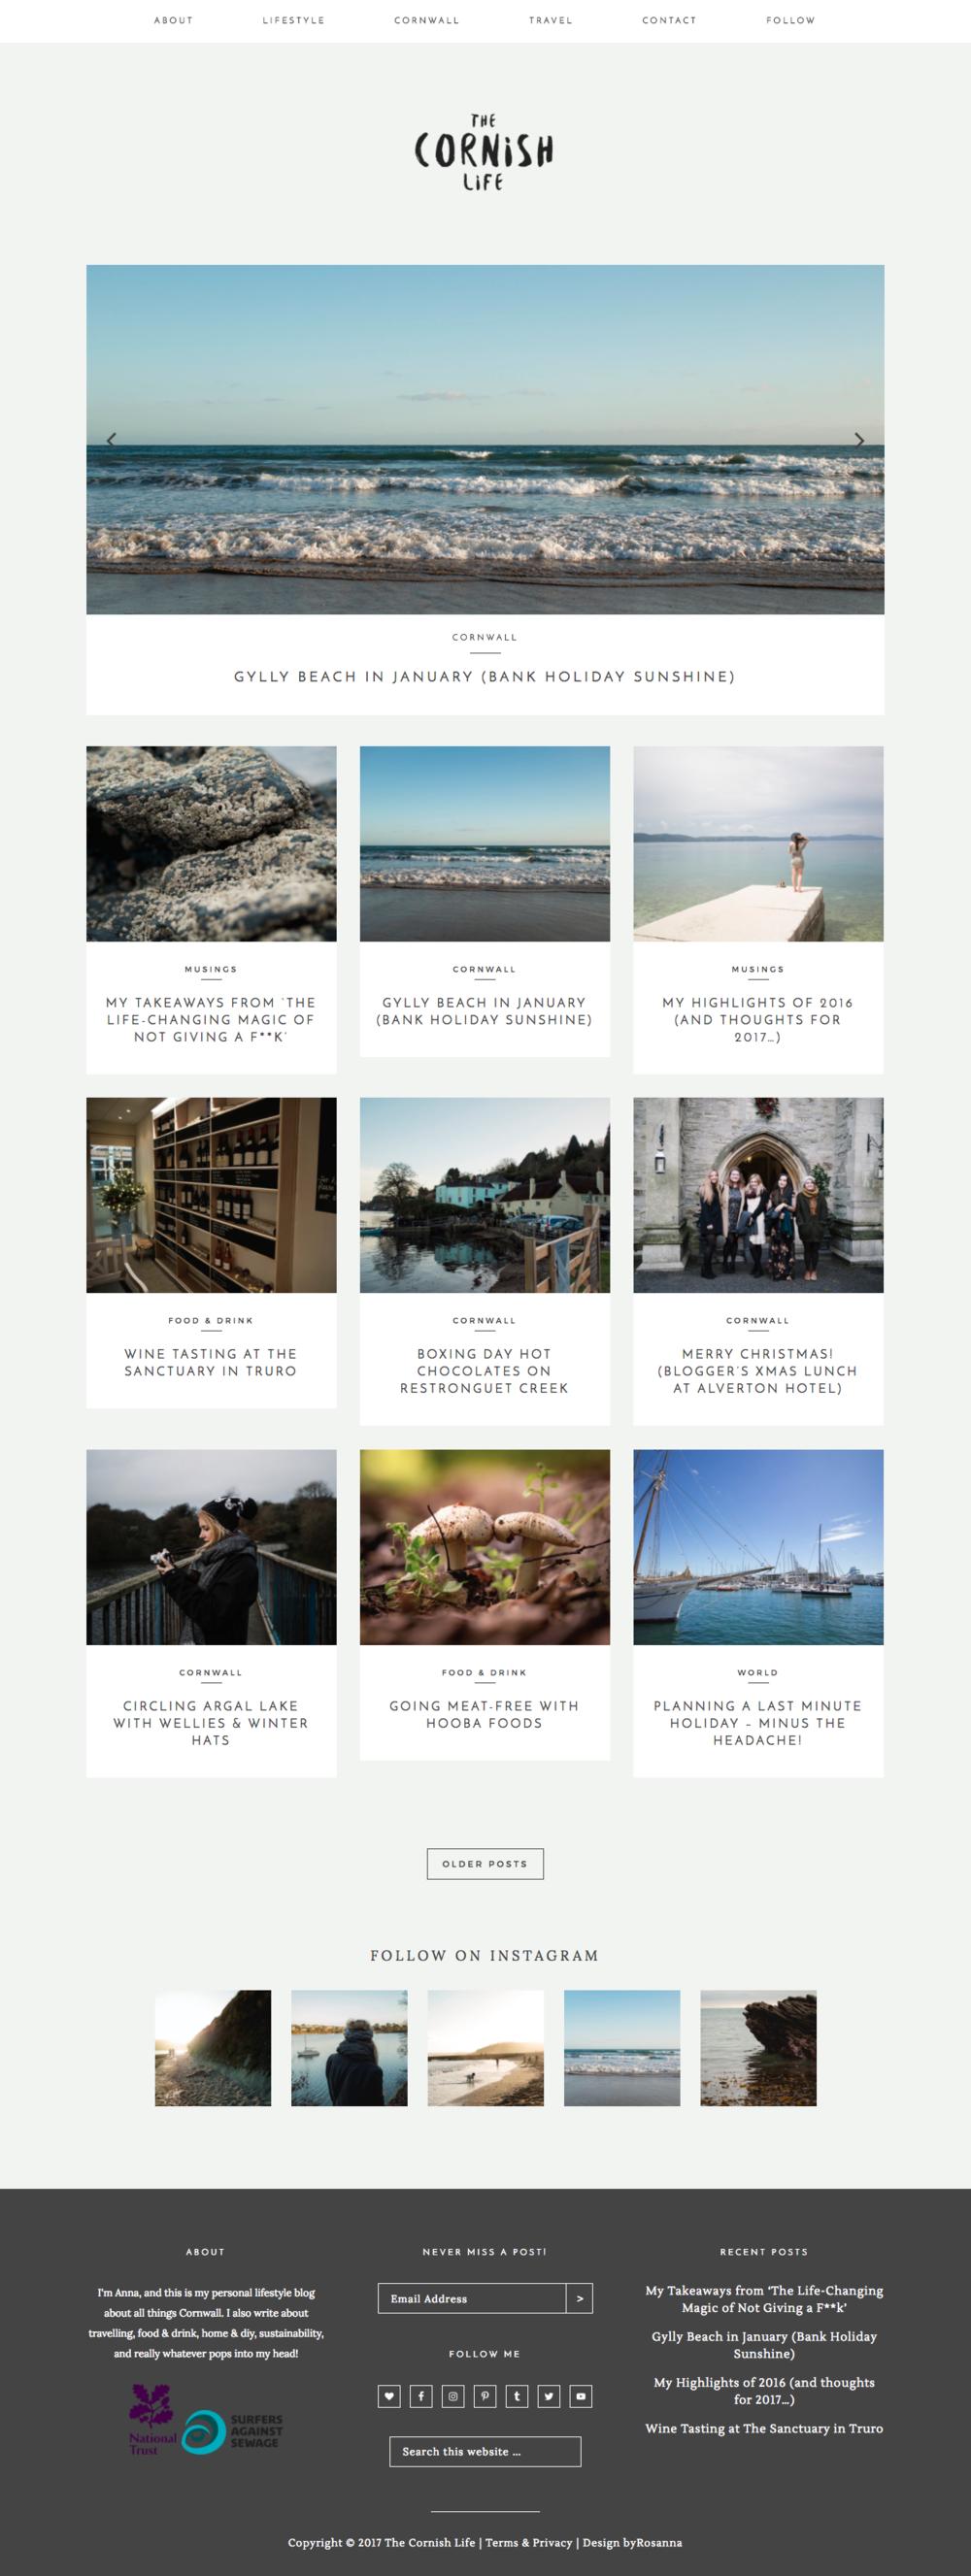 The Cornish Life Website Design | byRosanna